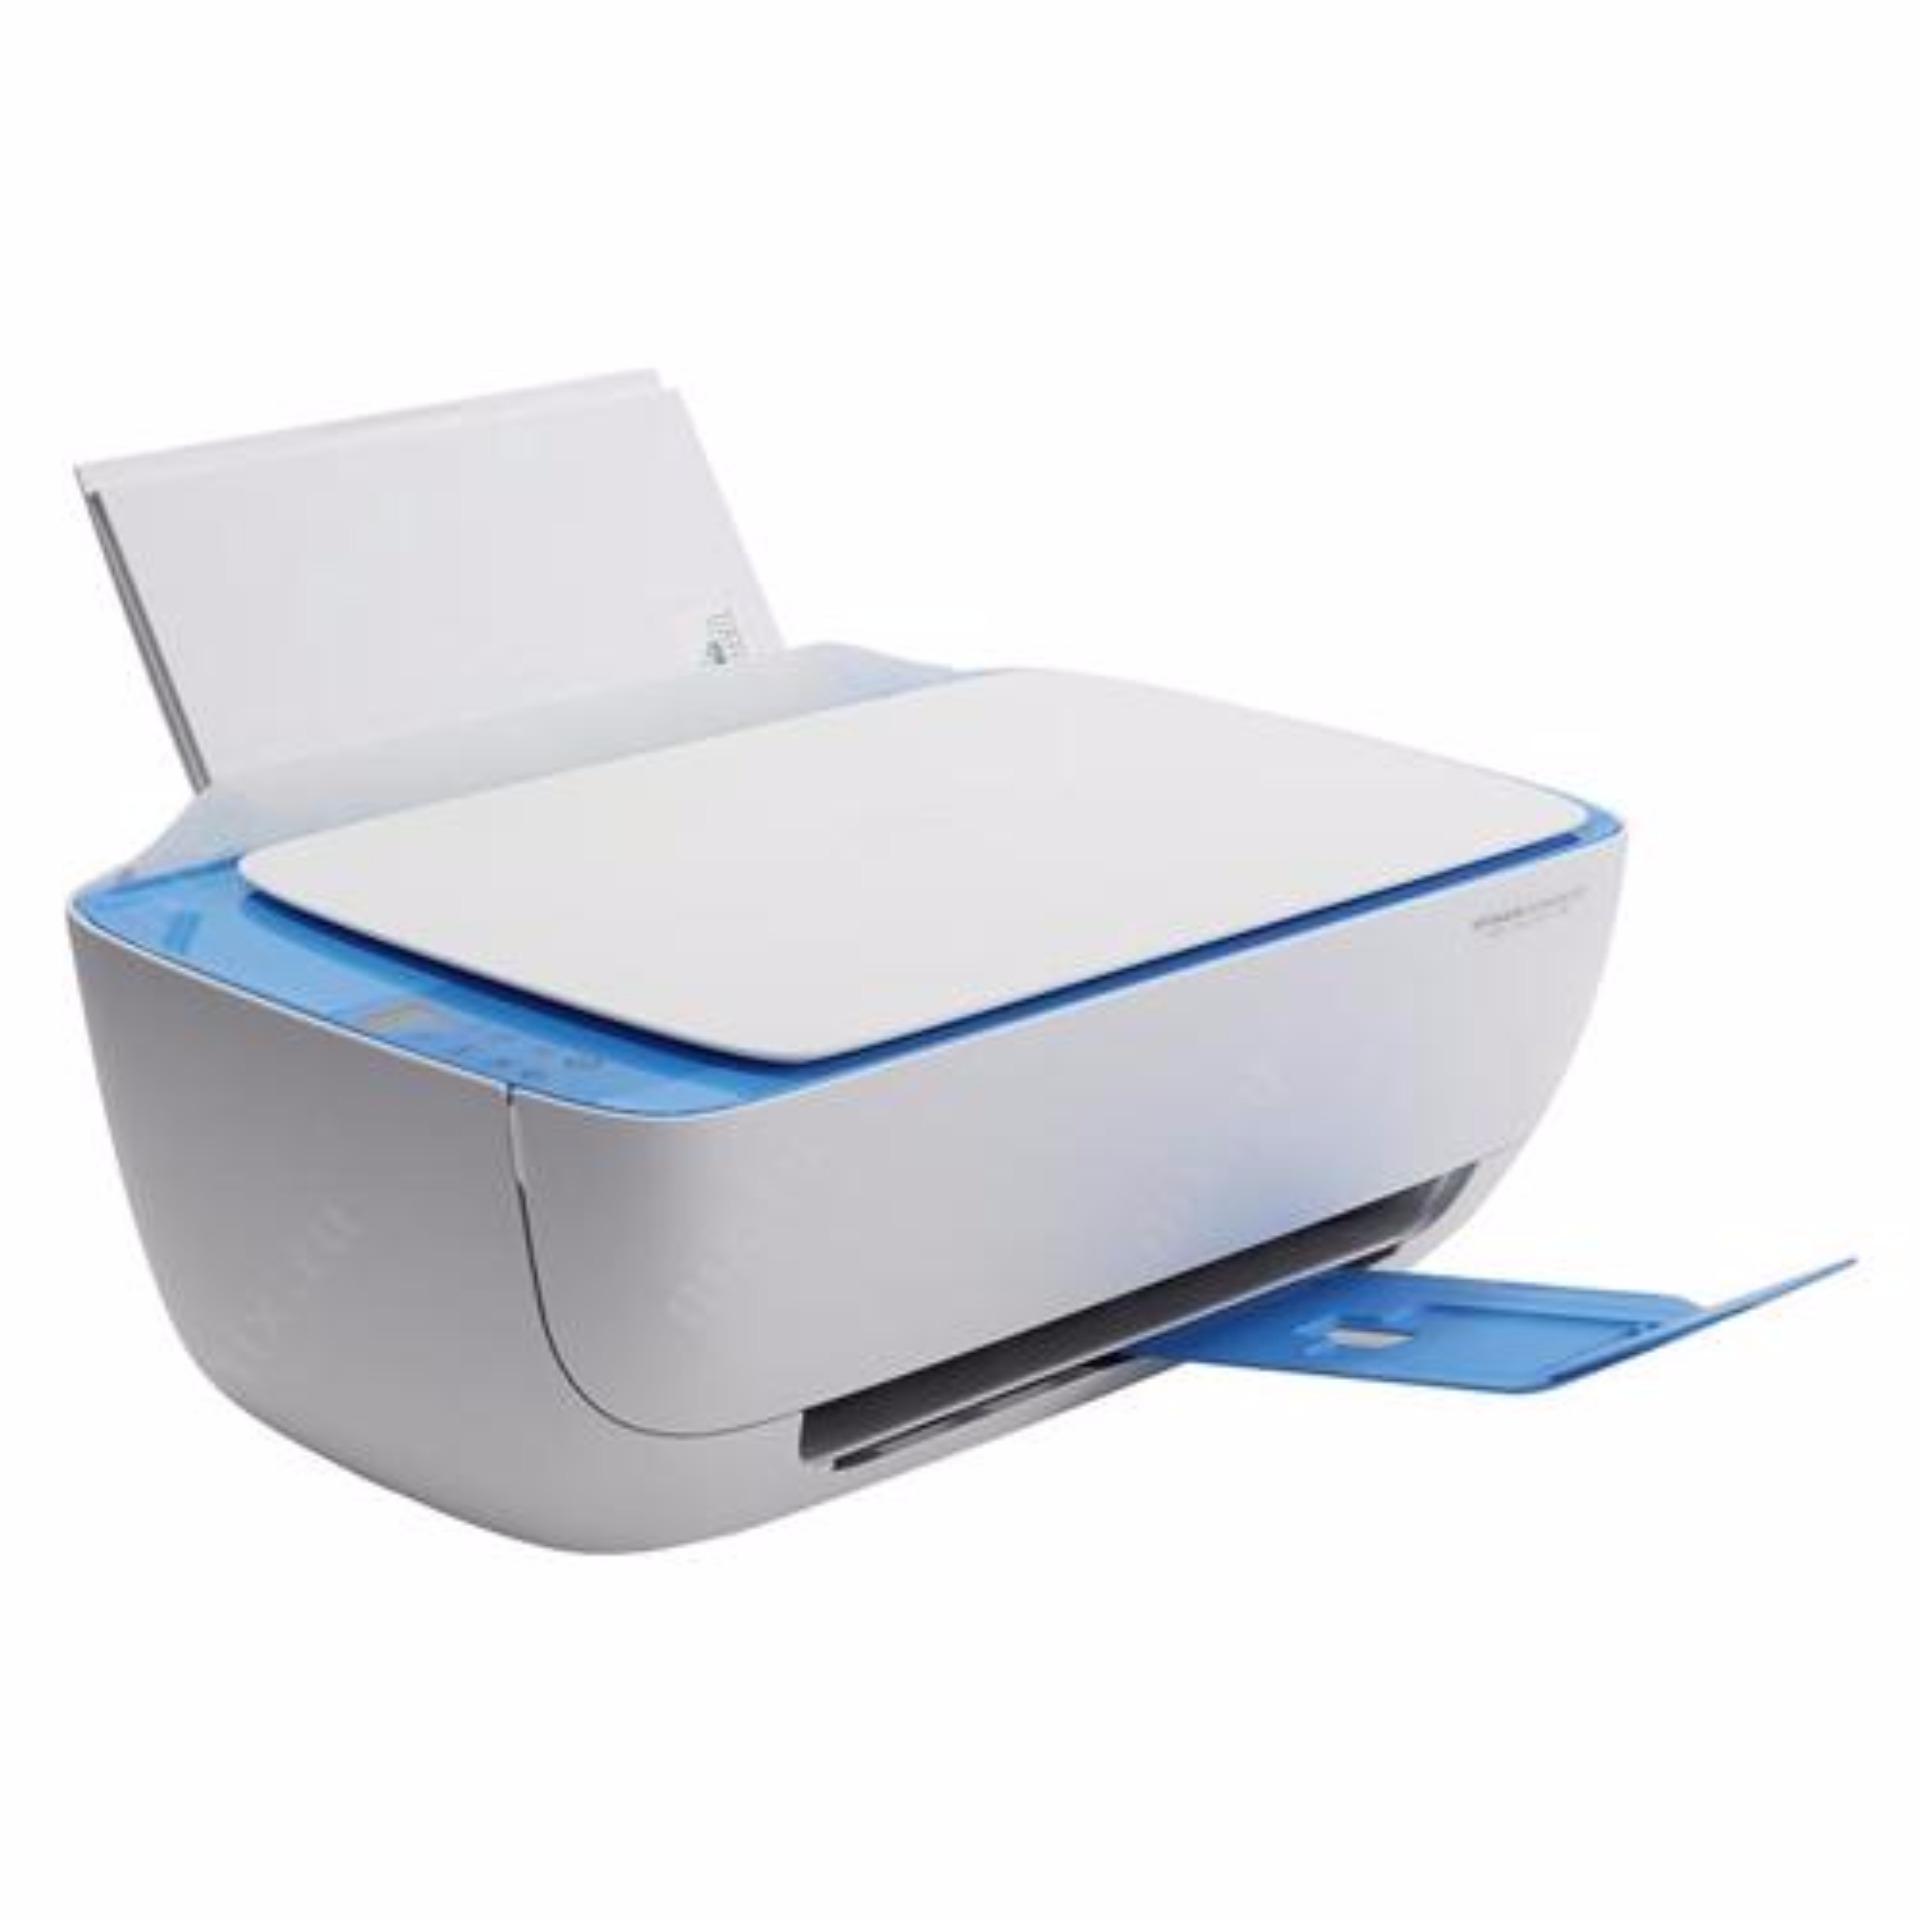 Cari Bandingkan Printer Hp Deskjet Ink Advantage 3635 All In One 4675 Wireless Wifidirect Termurah